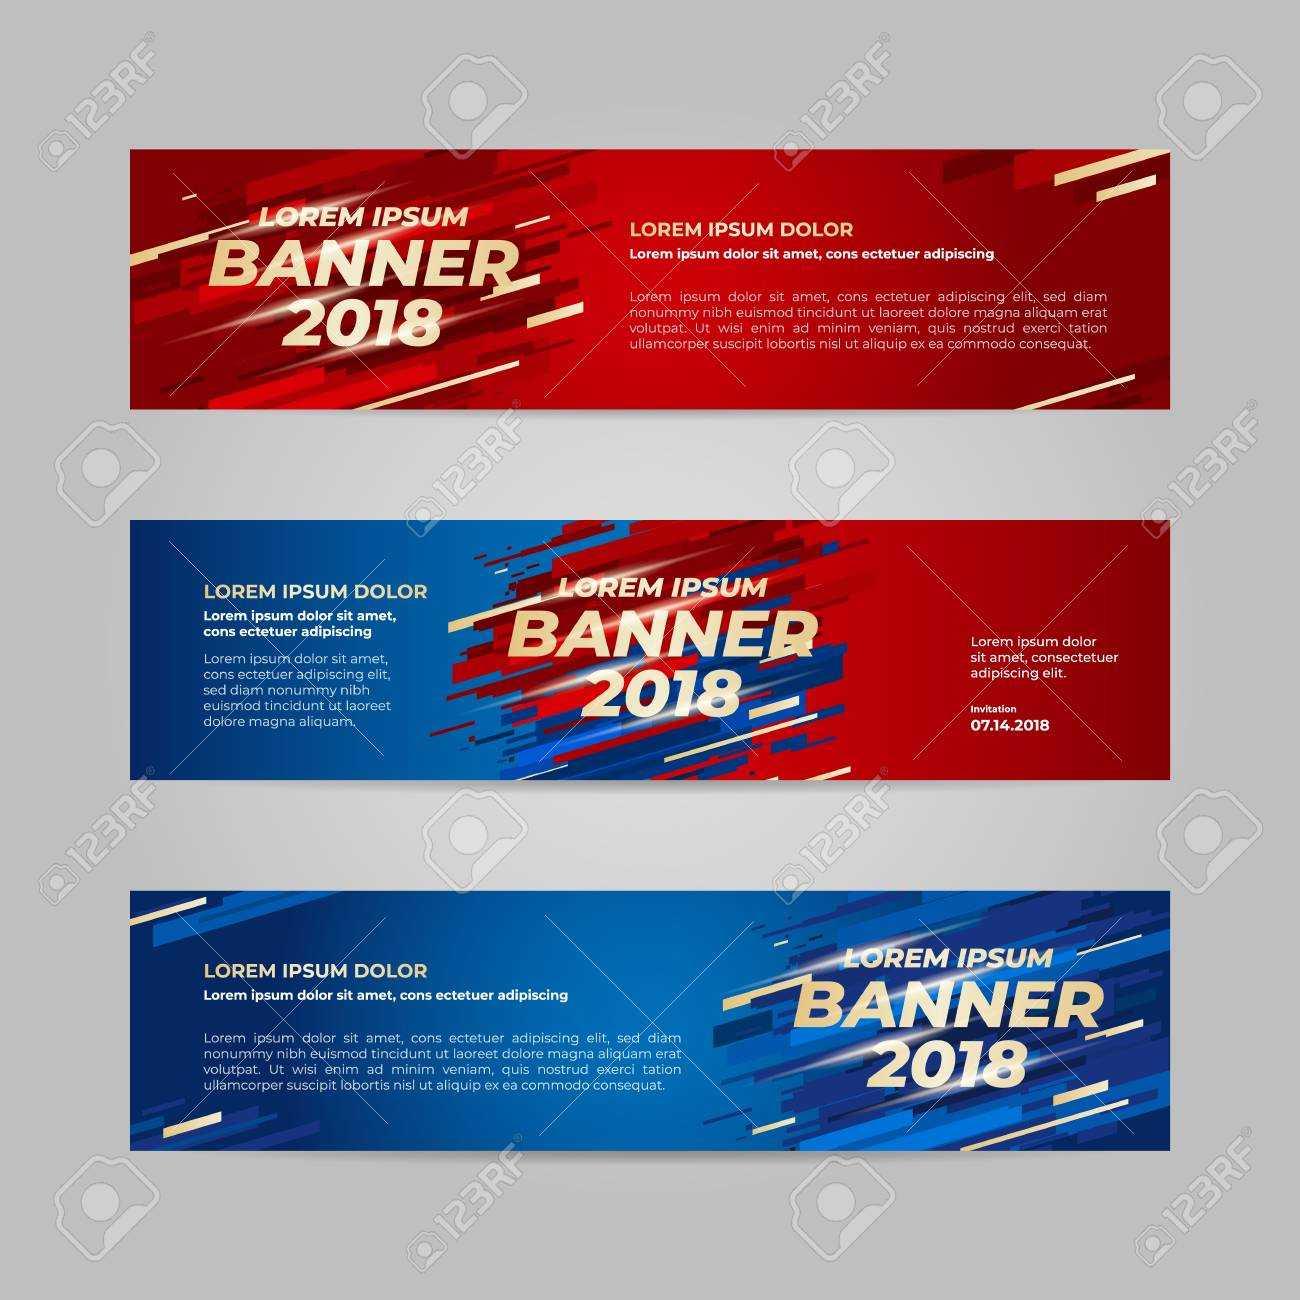 Vector Design Banner Web Template For Sport Event, 2018 Trend Intended For Event Banner Template